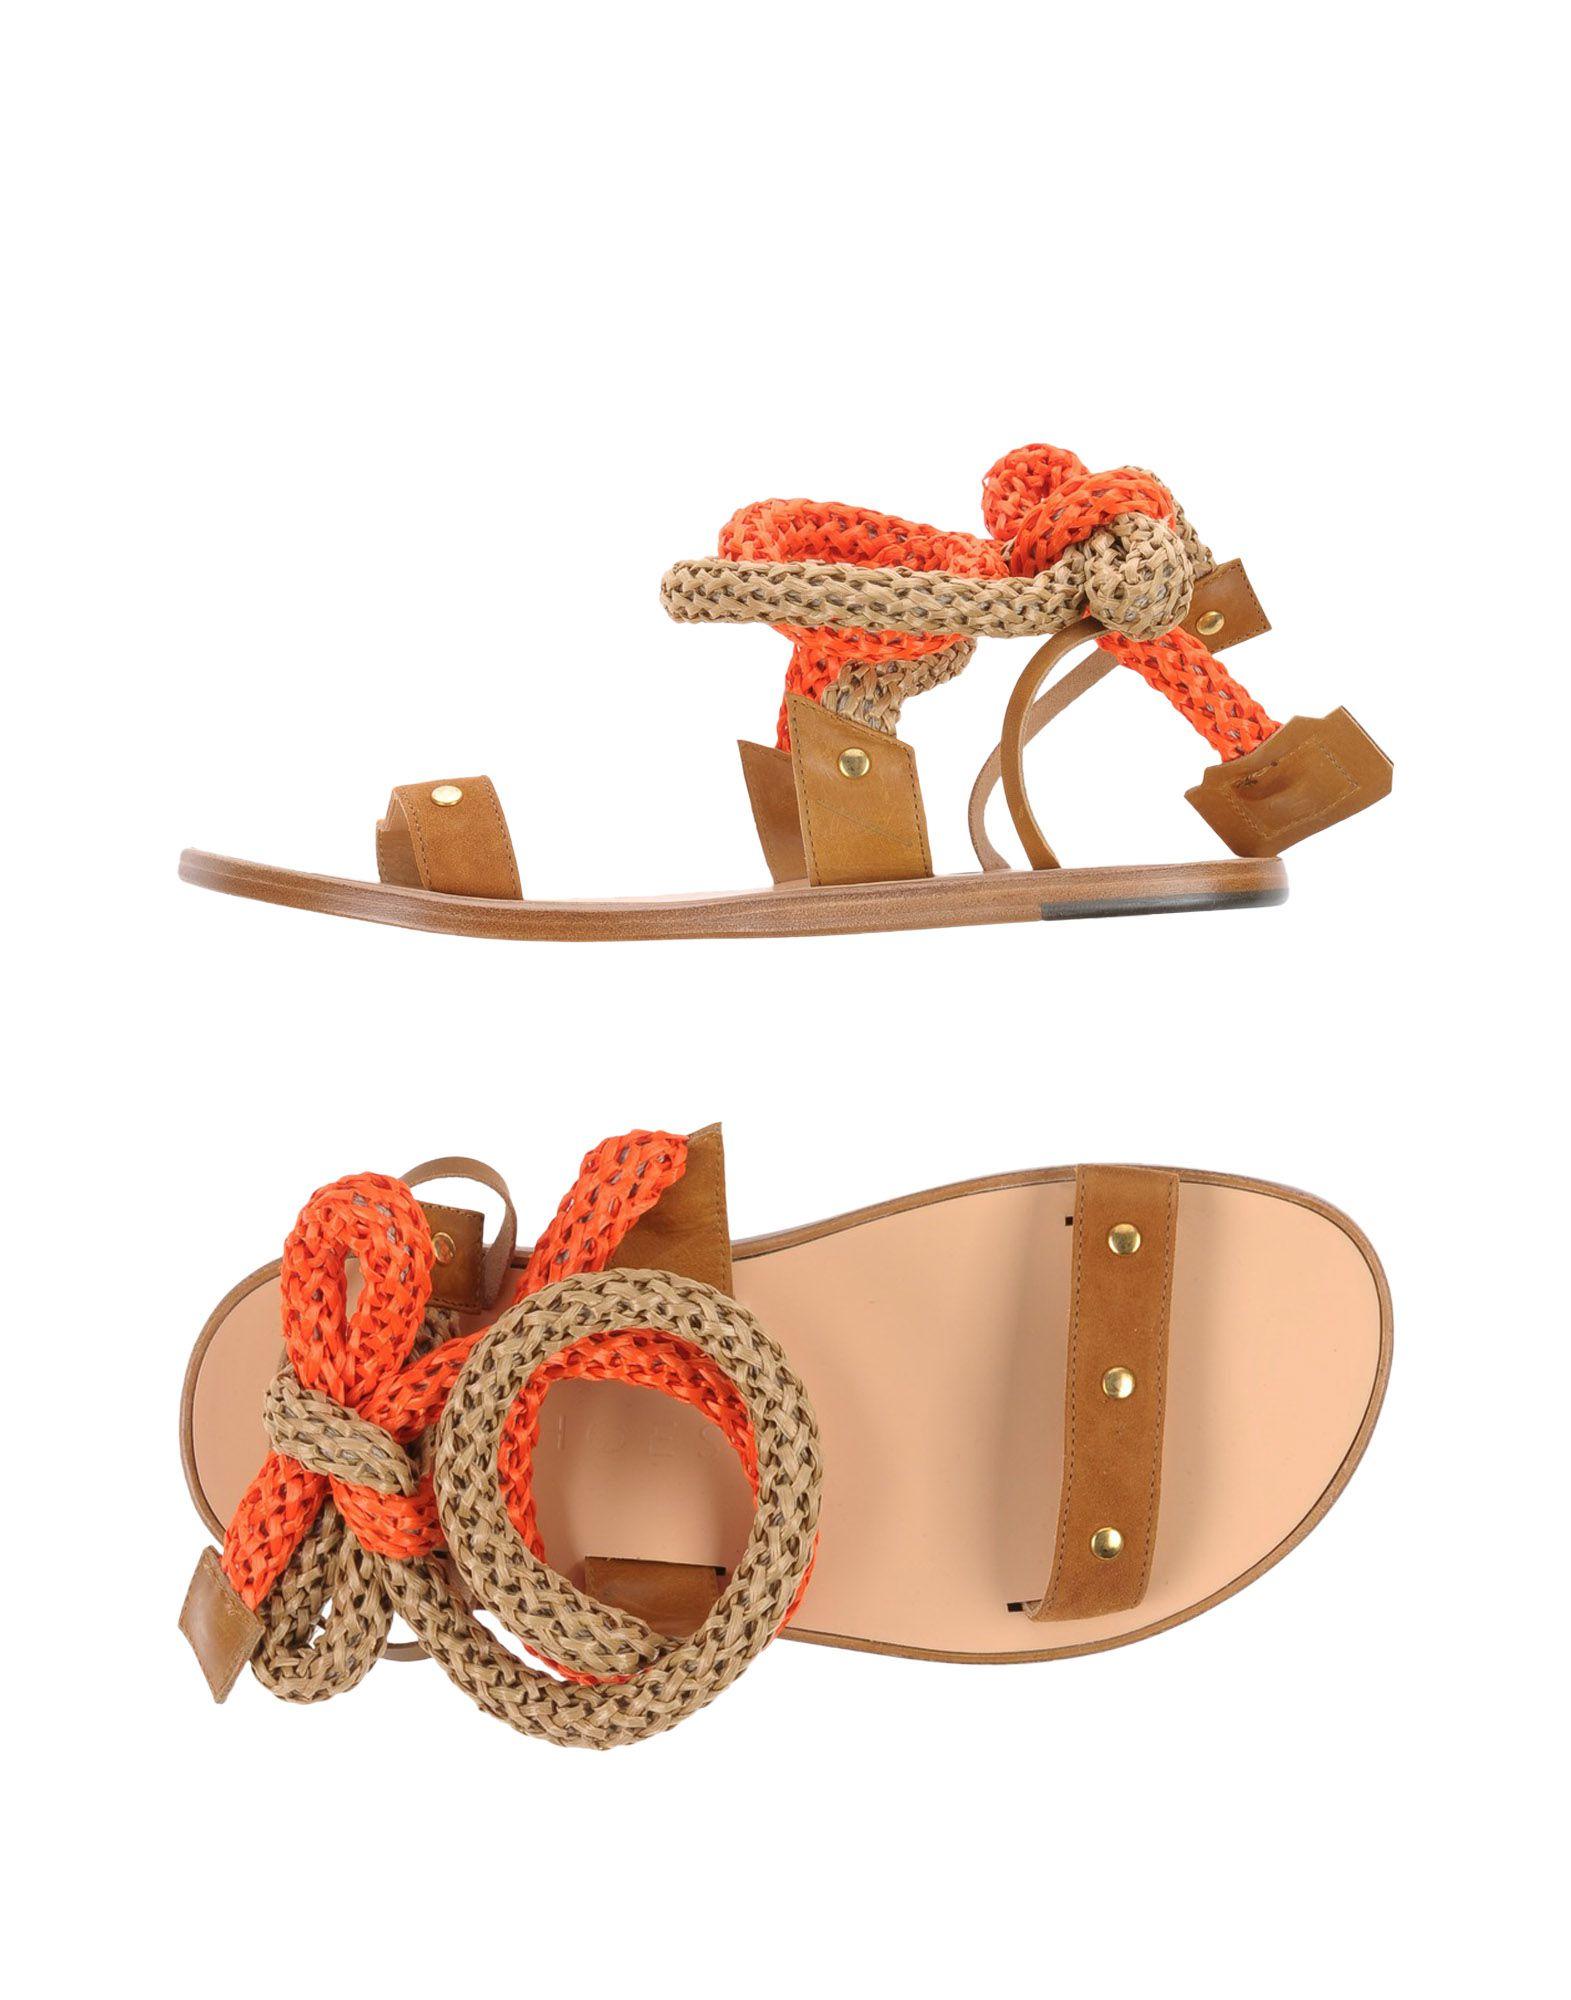 L'f Shoes Sandalen Damen  11416092KB Gute Qualität beliebte Schuhe